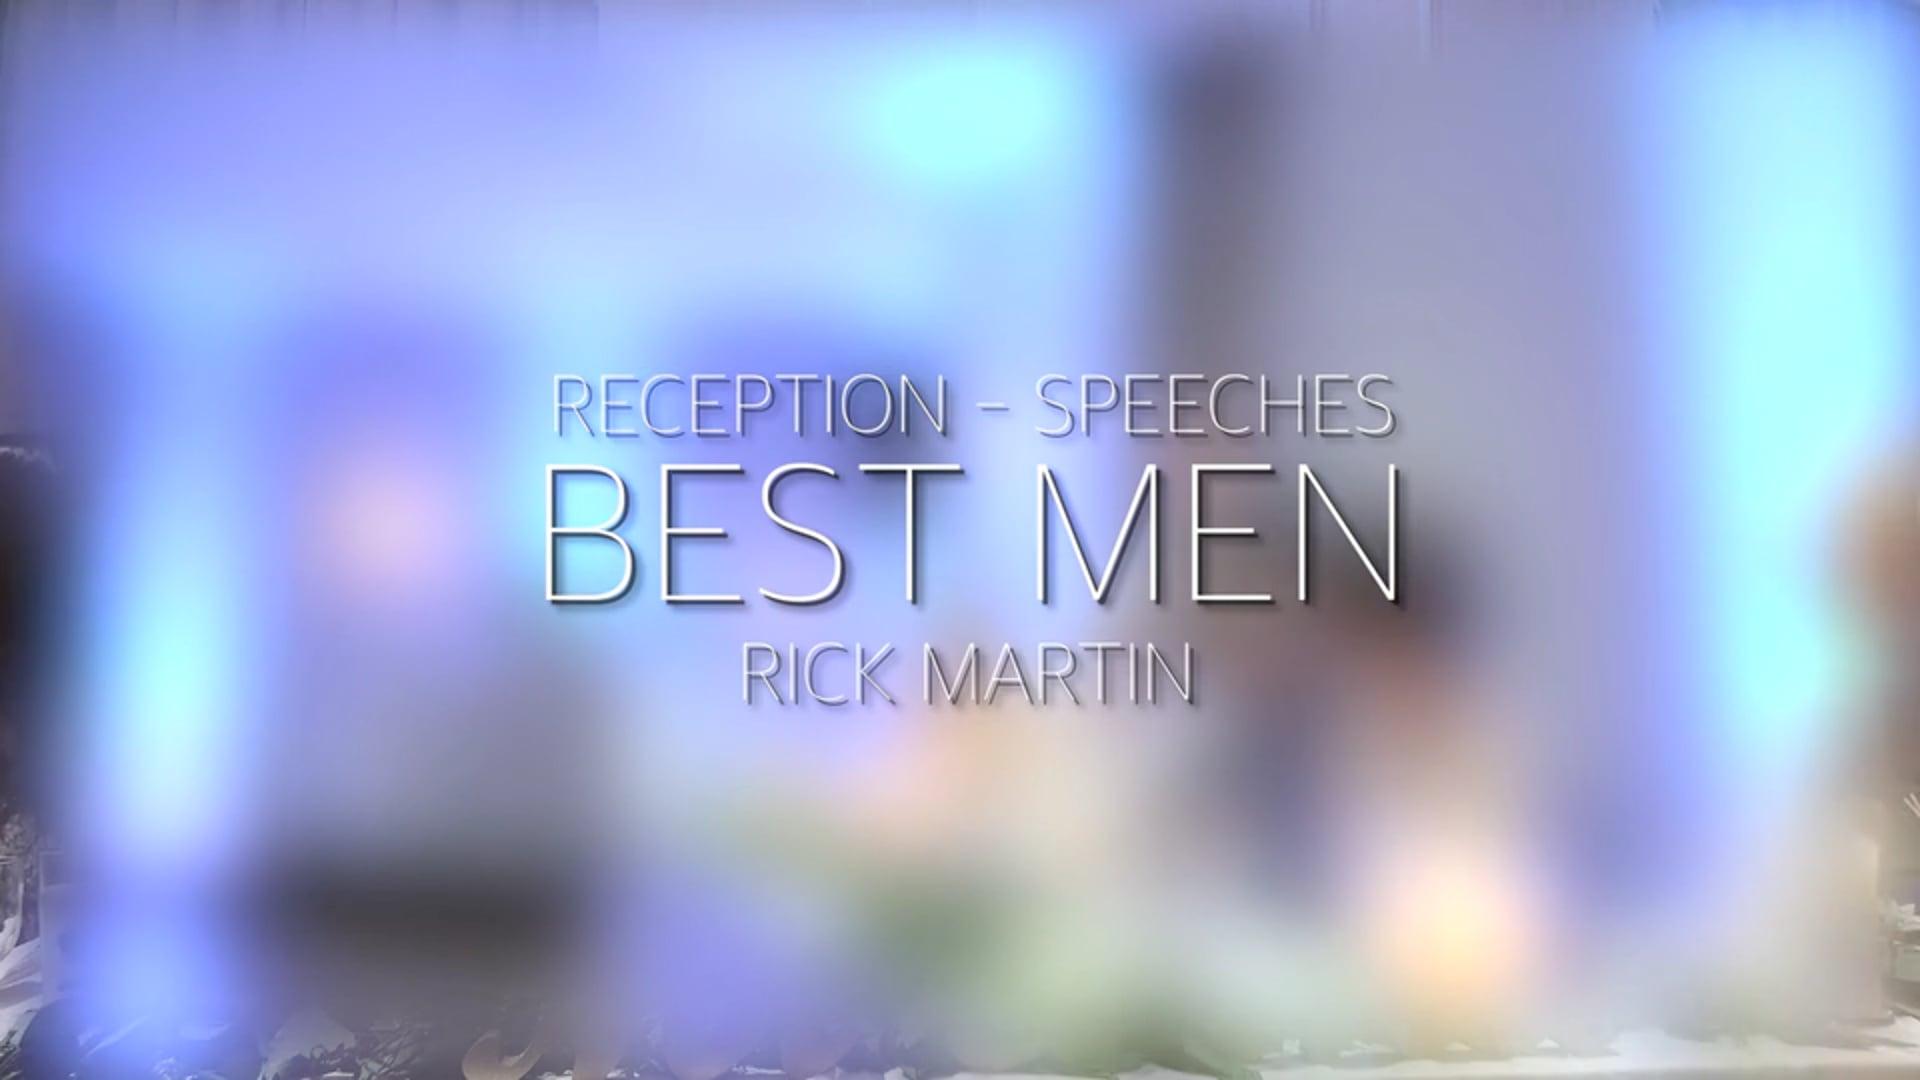 Doyle Wedding Reception - Bestman Speech 2 - Rick